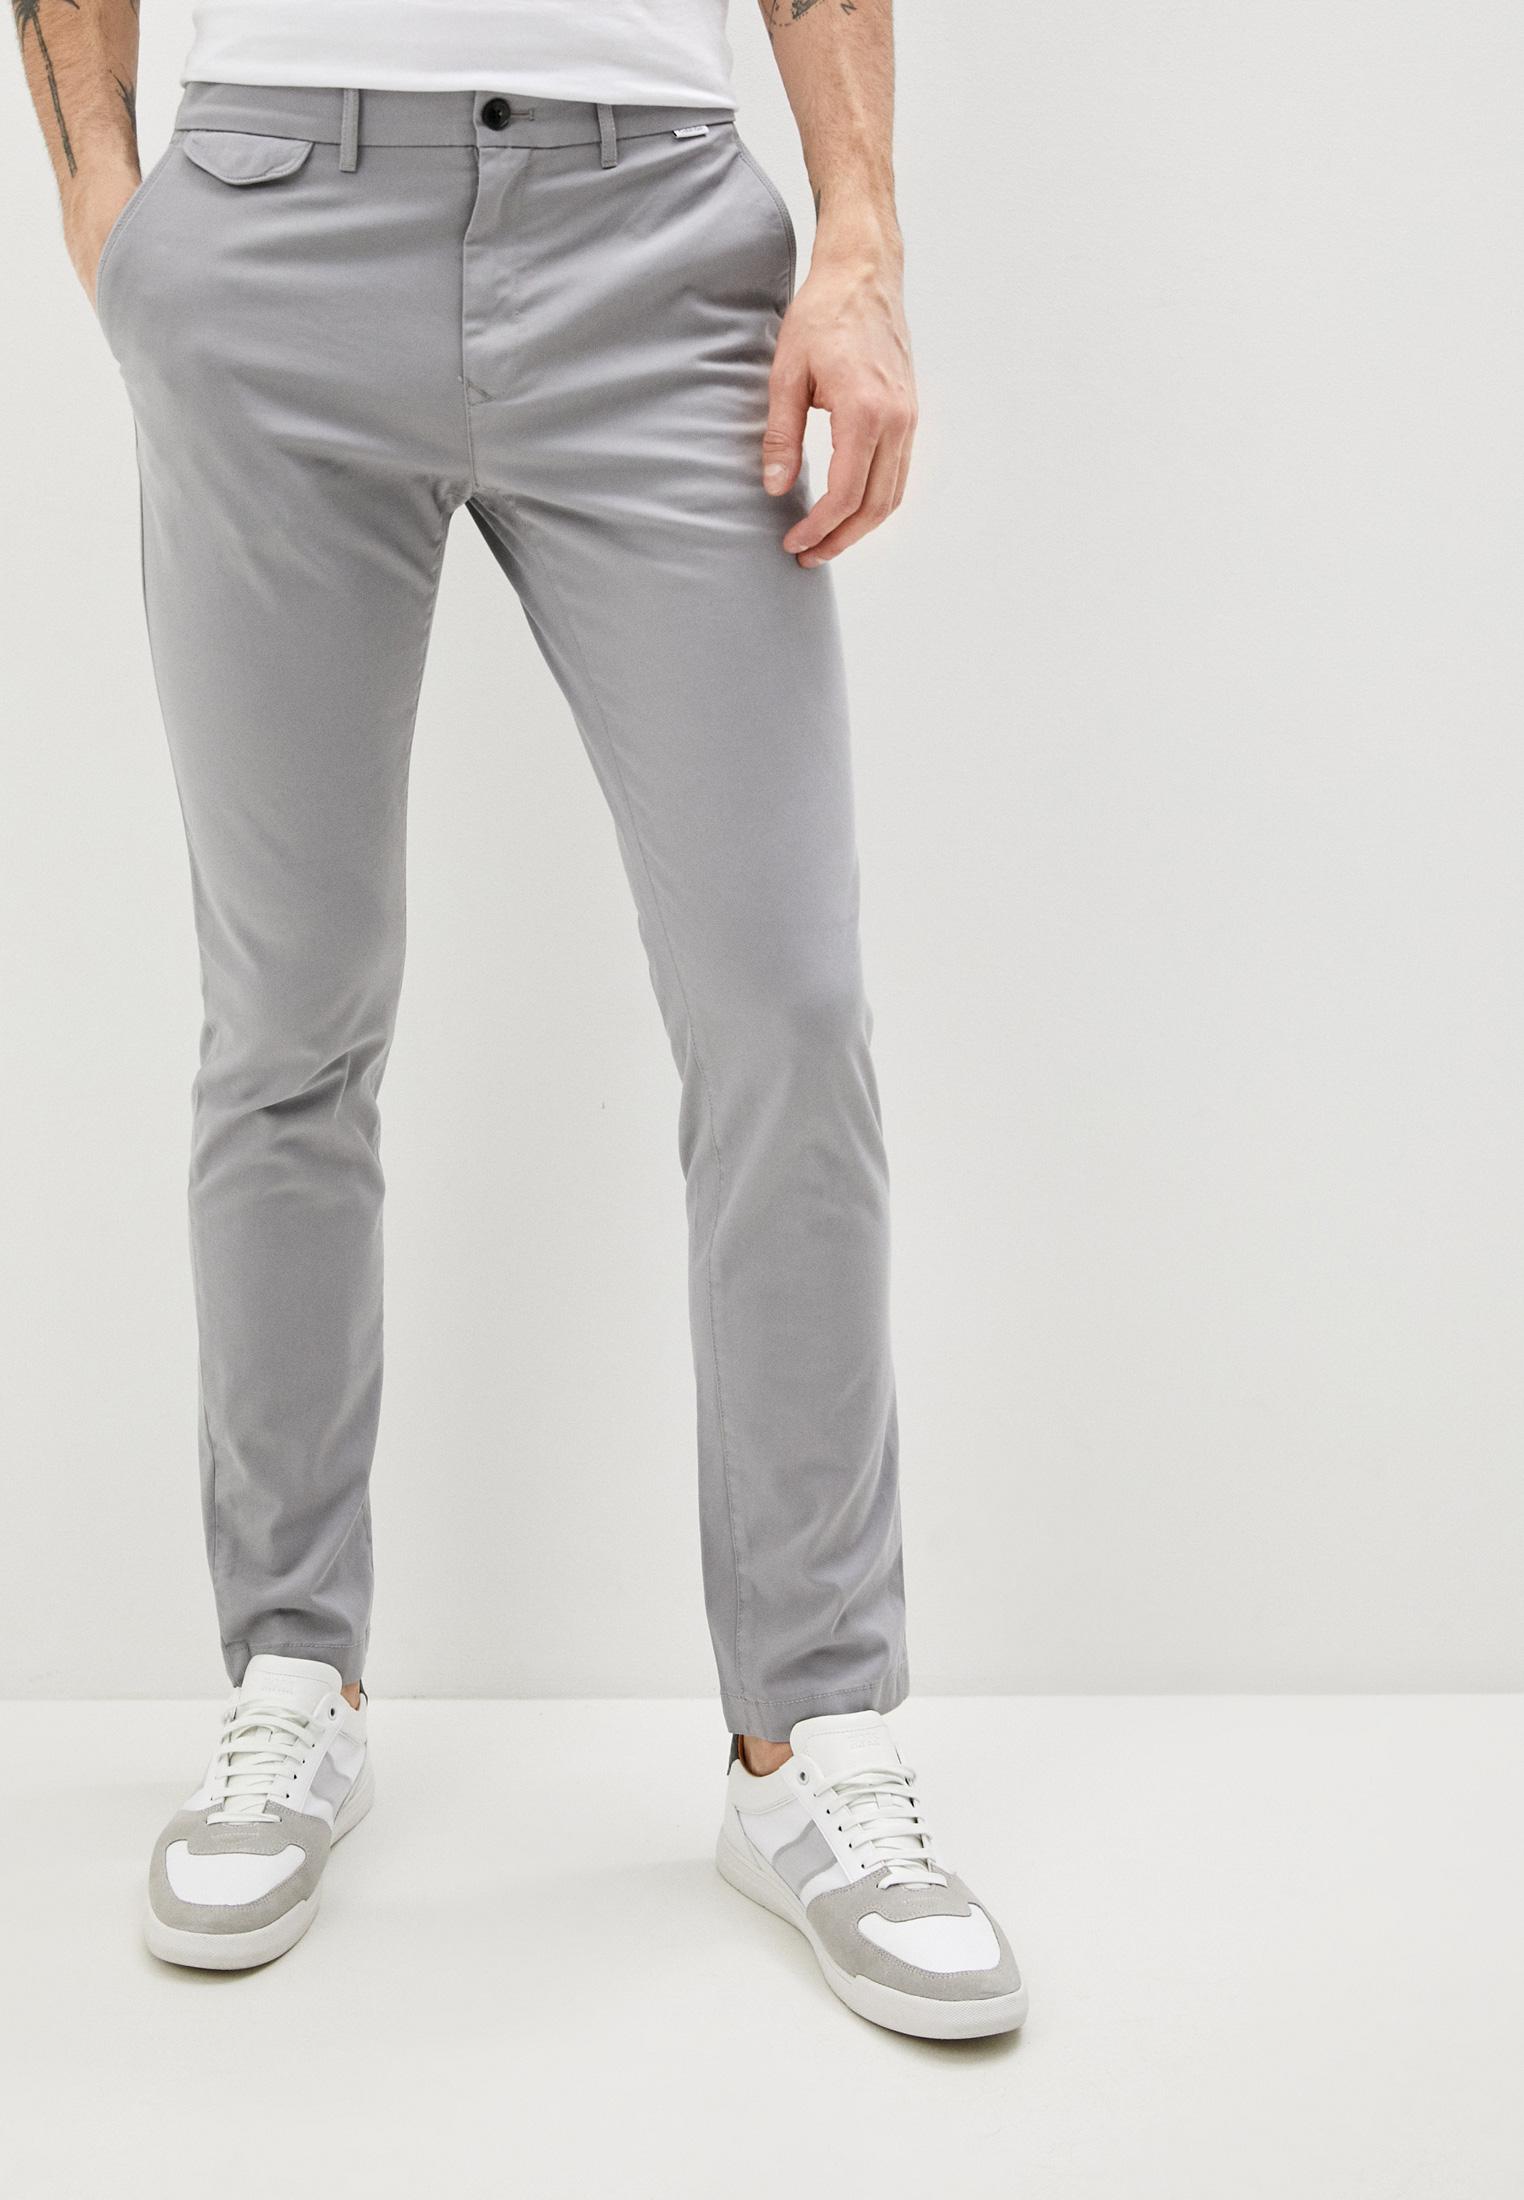 Мужские брюки Calvin Klein (Кельвин Кляйн) k10k104974